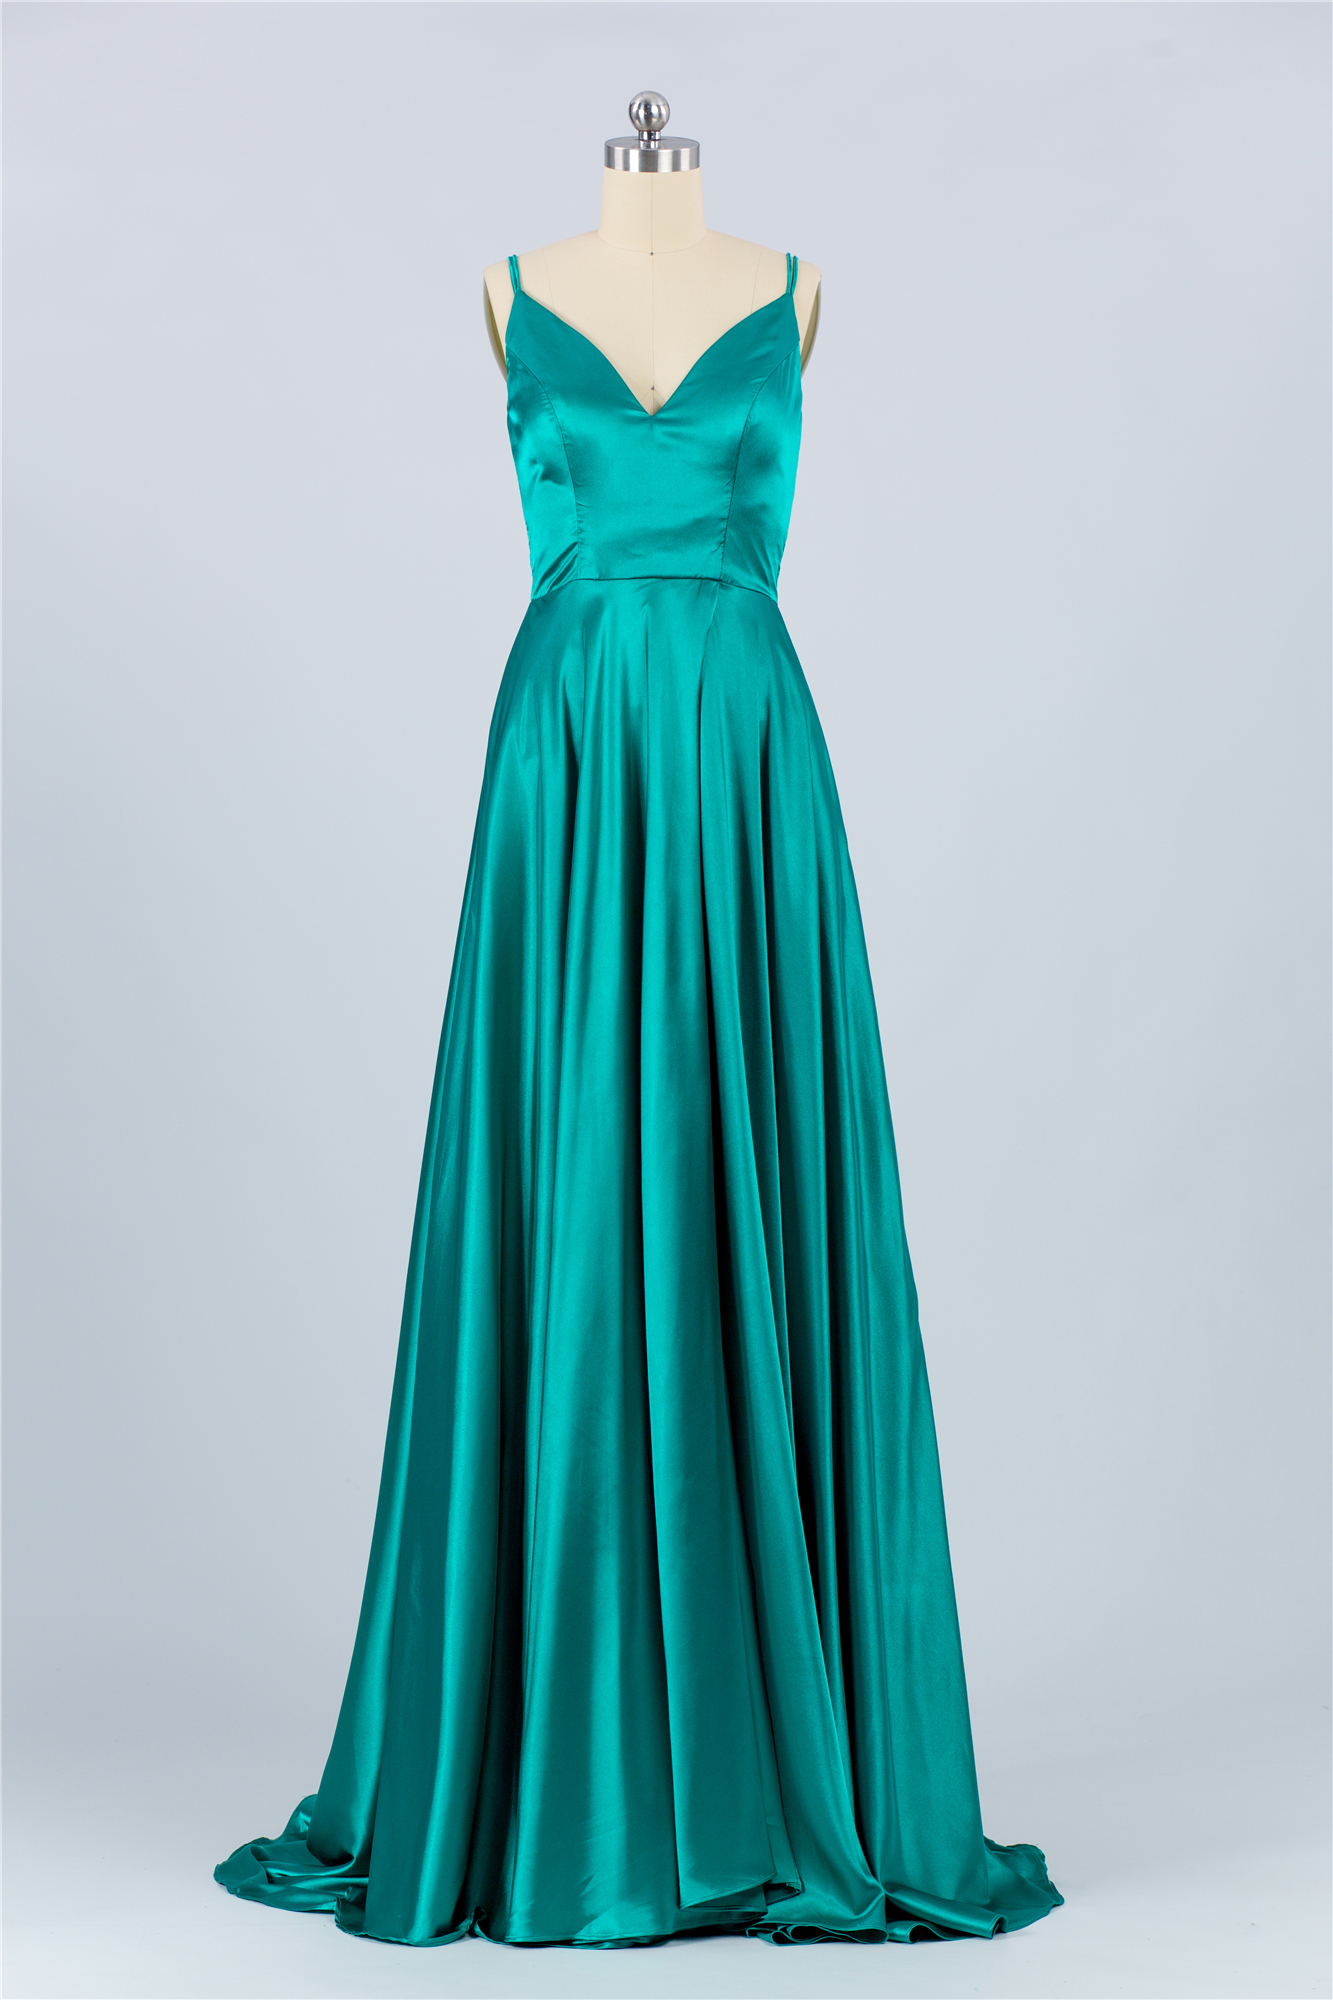 Silk like green fabric nice Evening Dress 2020 Pleated V-neck elegant luckgirls Customizable prom Dress mocini tailor